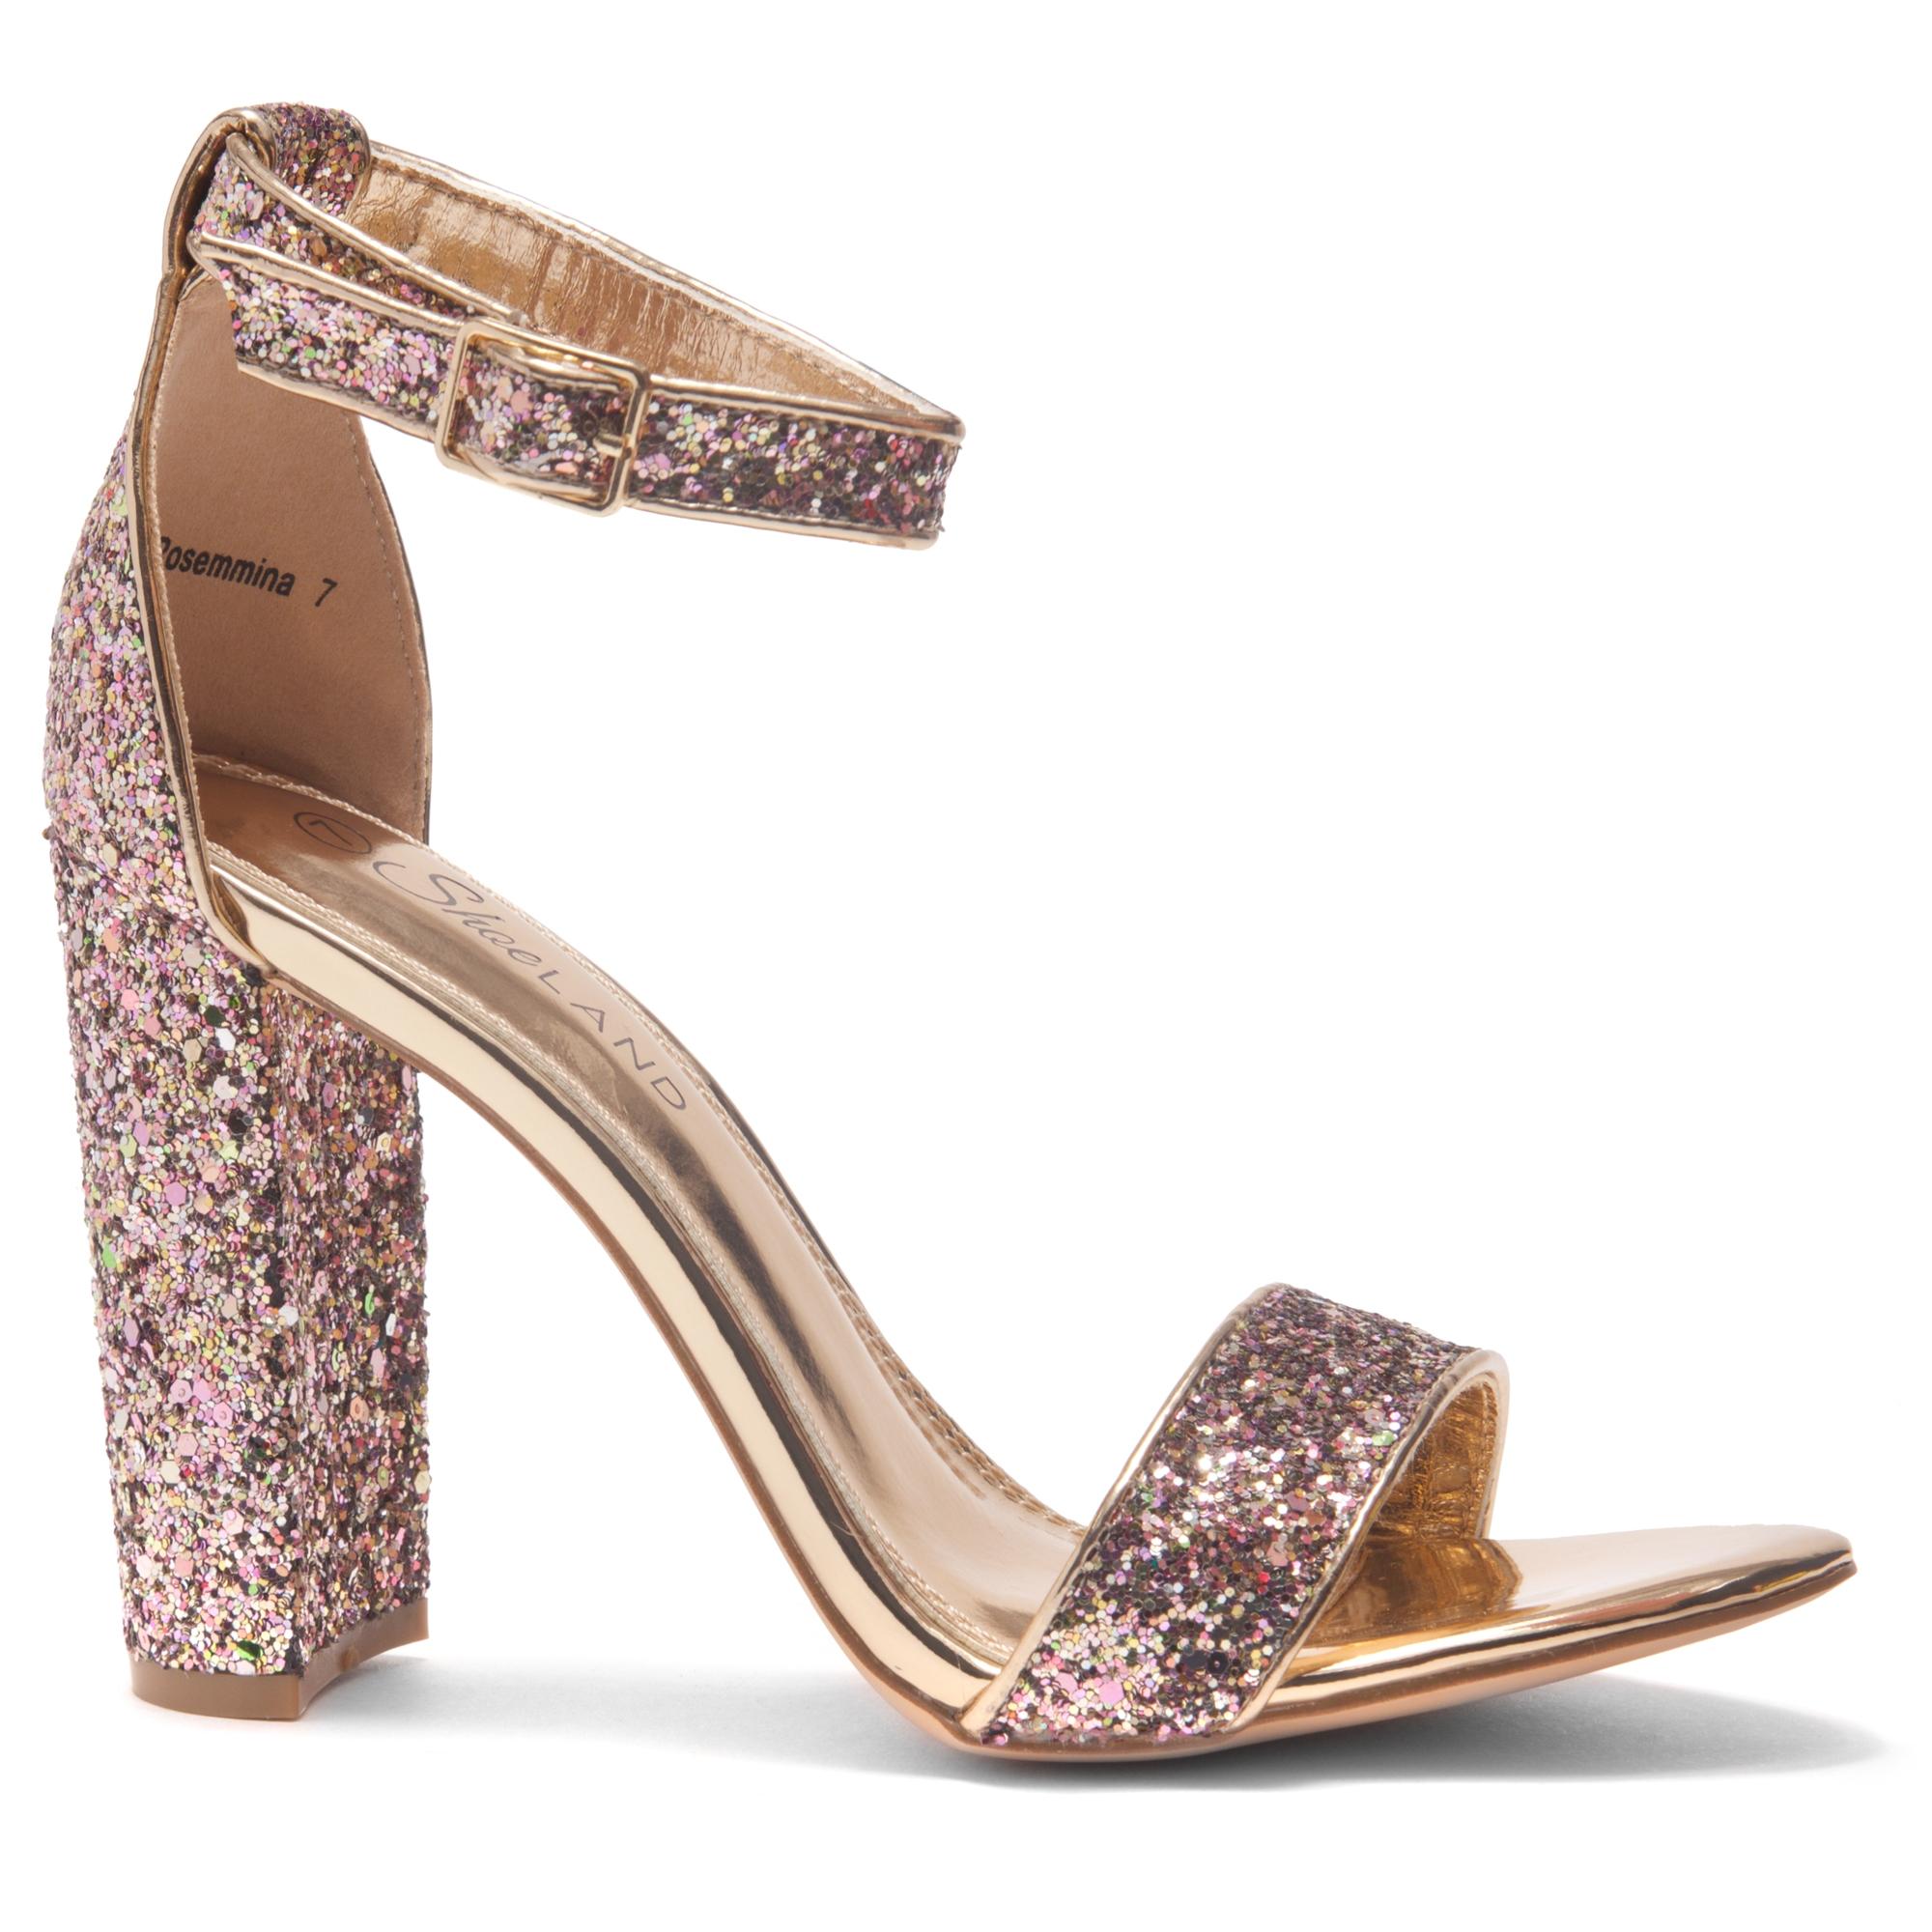 06d9920bd89 HerStyle Rosemmina Open Toe Ankle Strap Chunky Heel (RoseGoldGlitter)